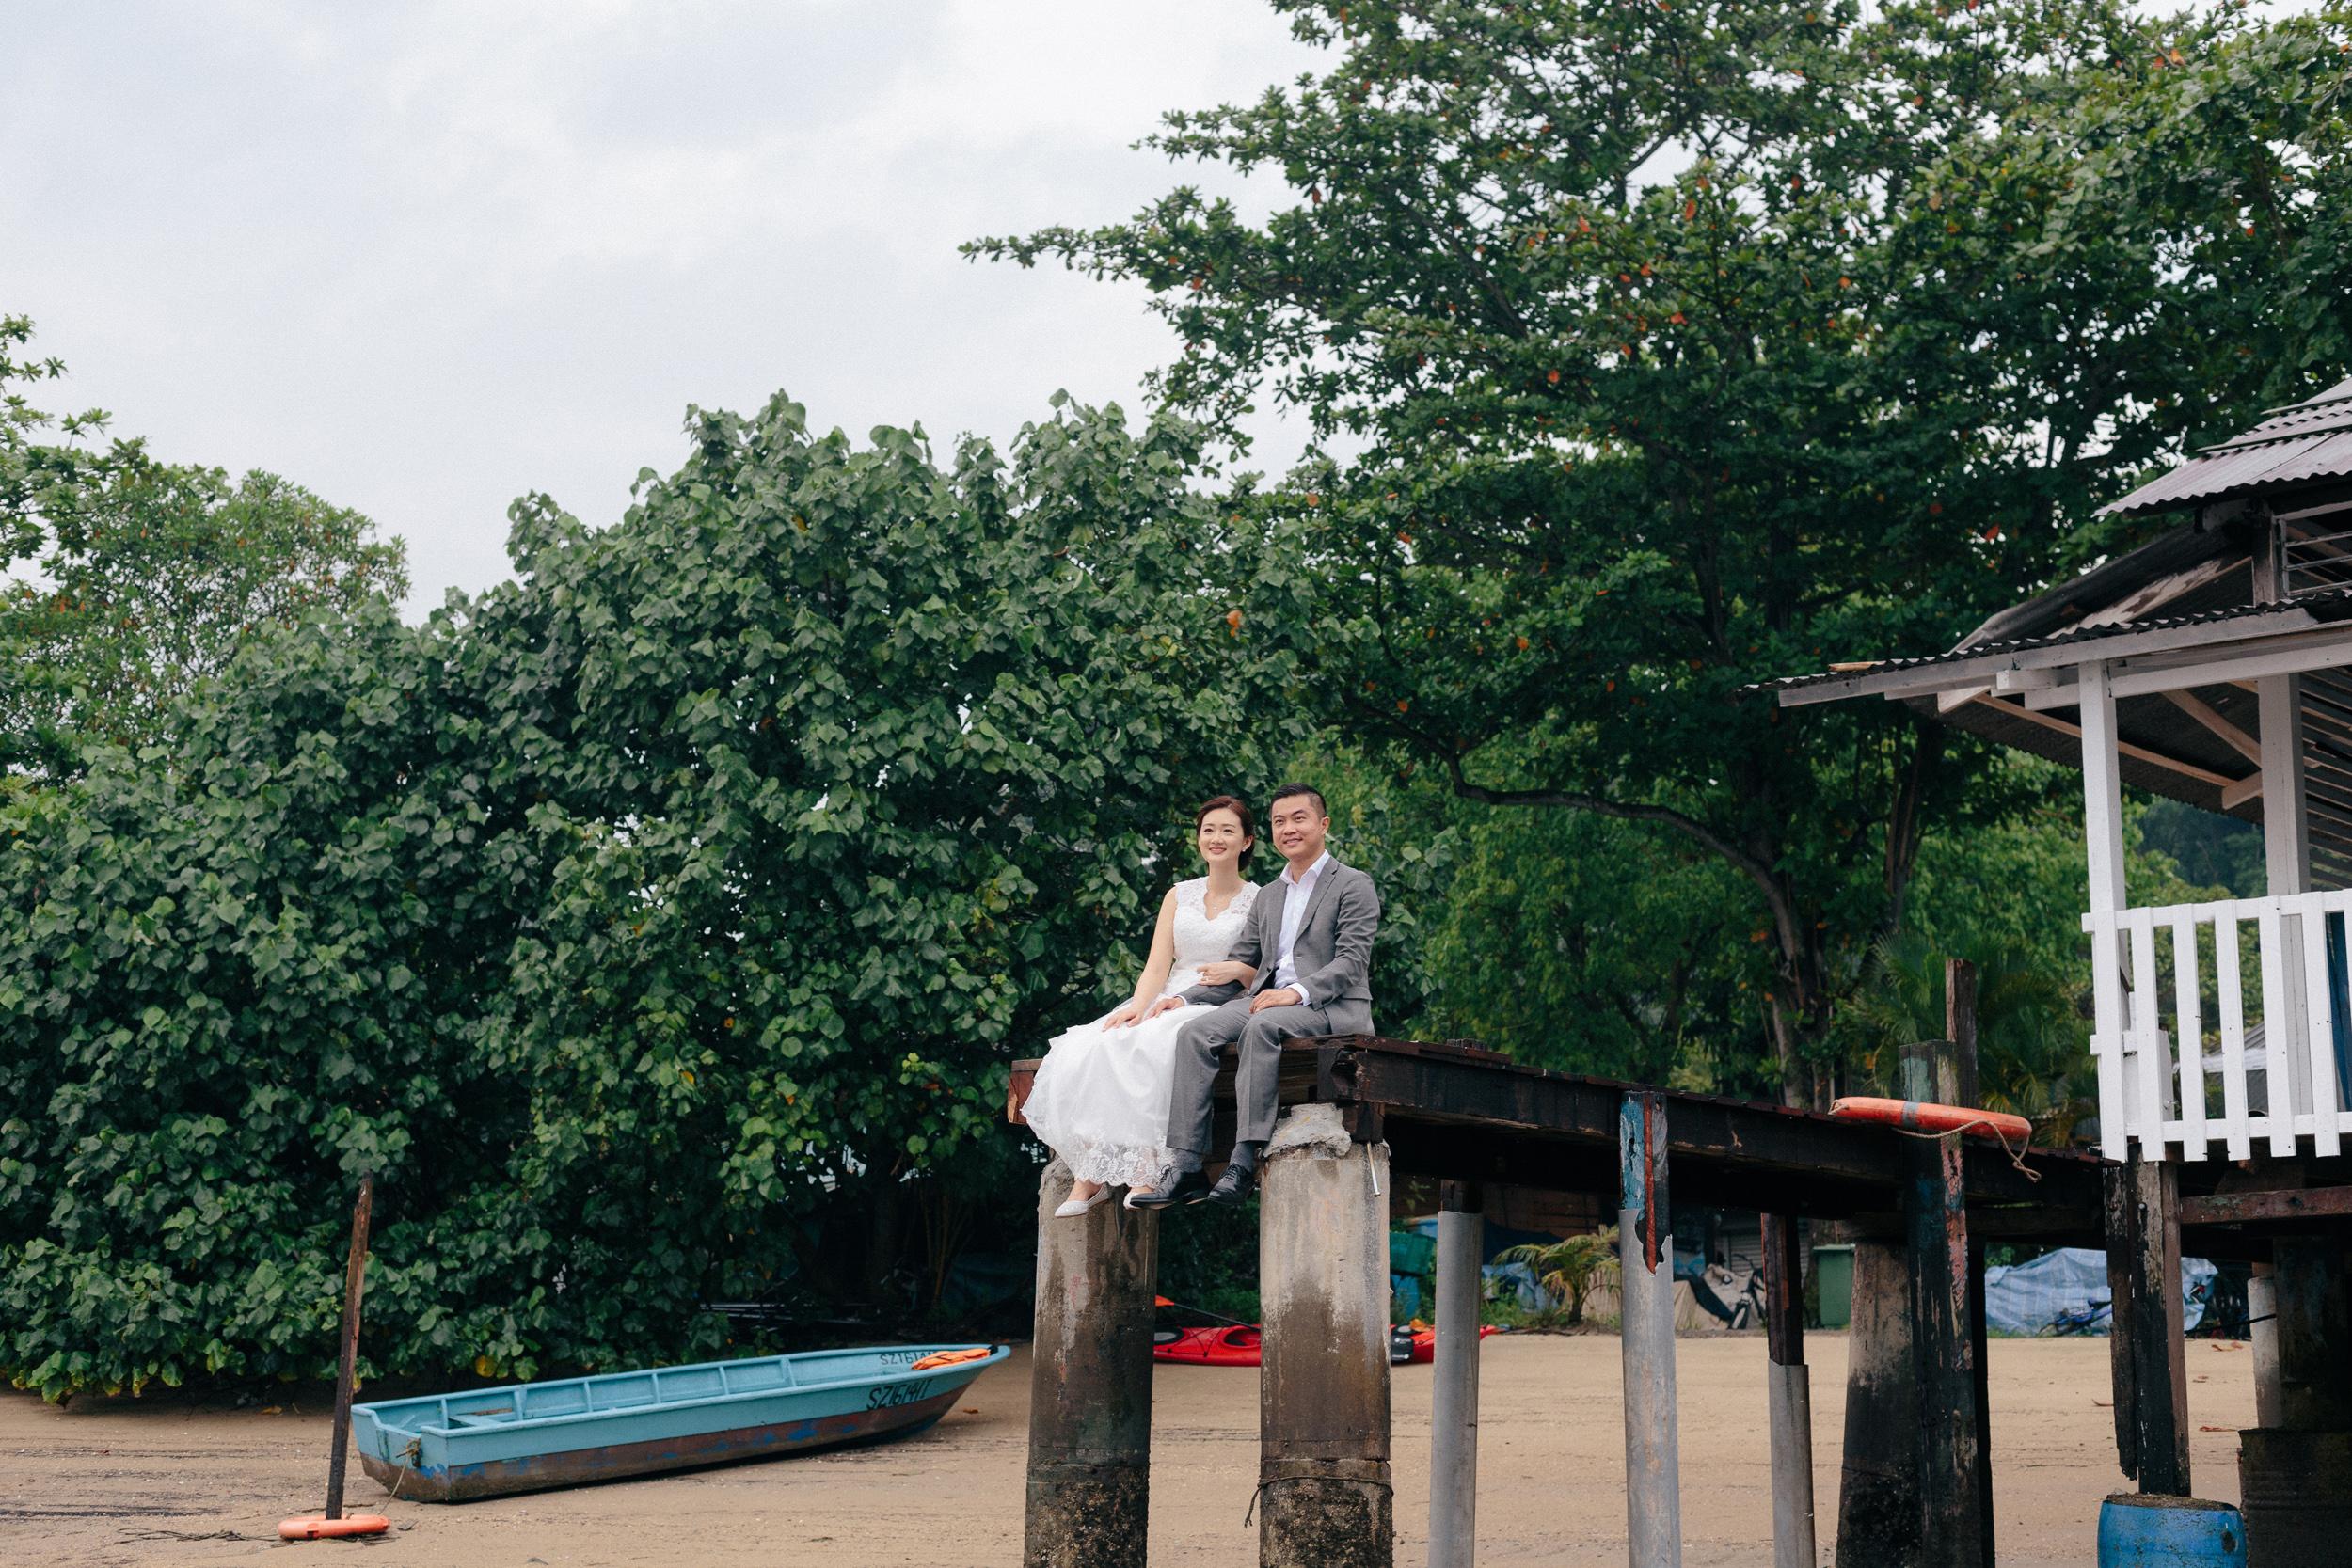 singapore-wedding-photographer-wemadethese-junekit-kingslin-15.jpg